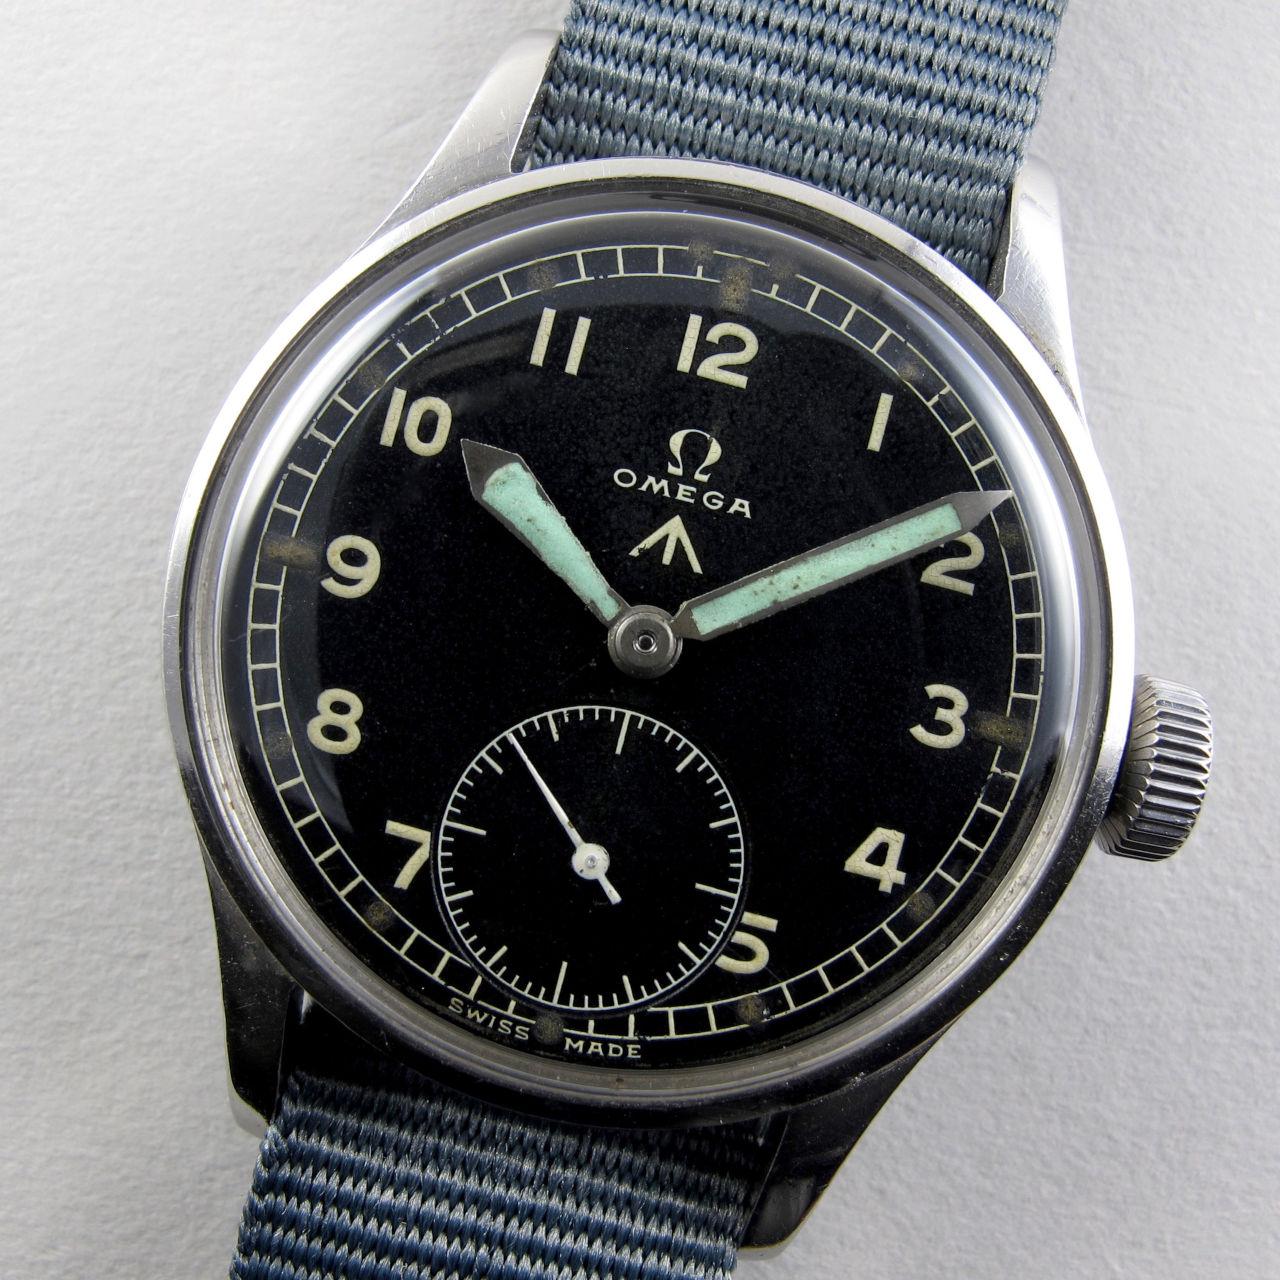 omega-www-military-steel-vintage-wristwatch-circa-1945-wxom-v001